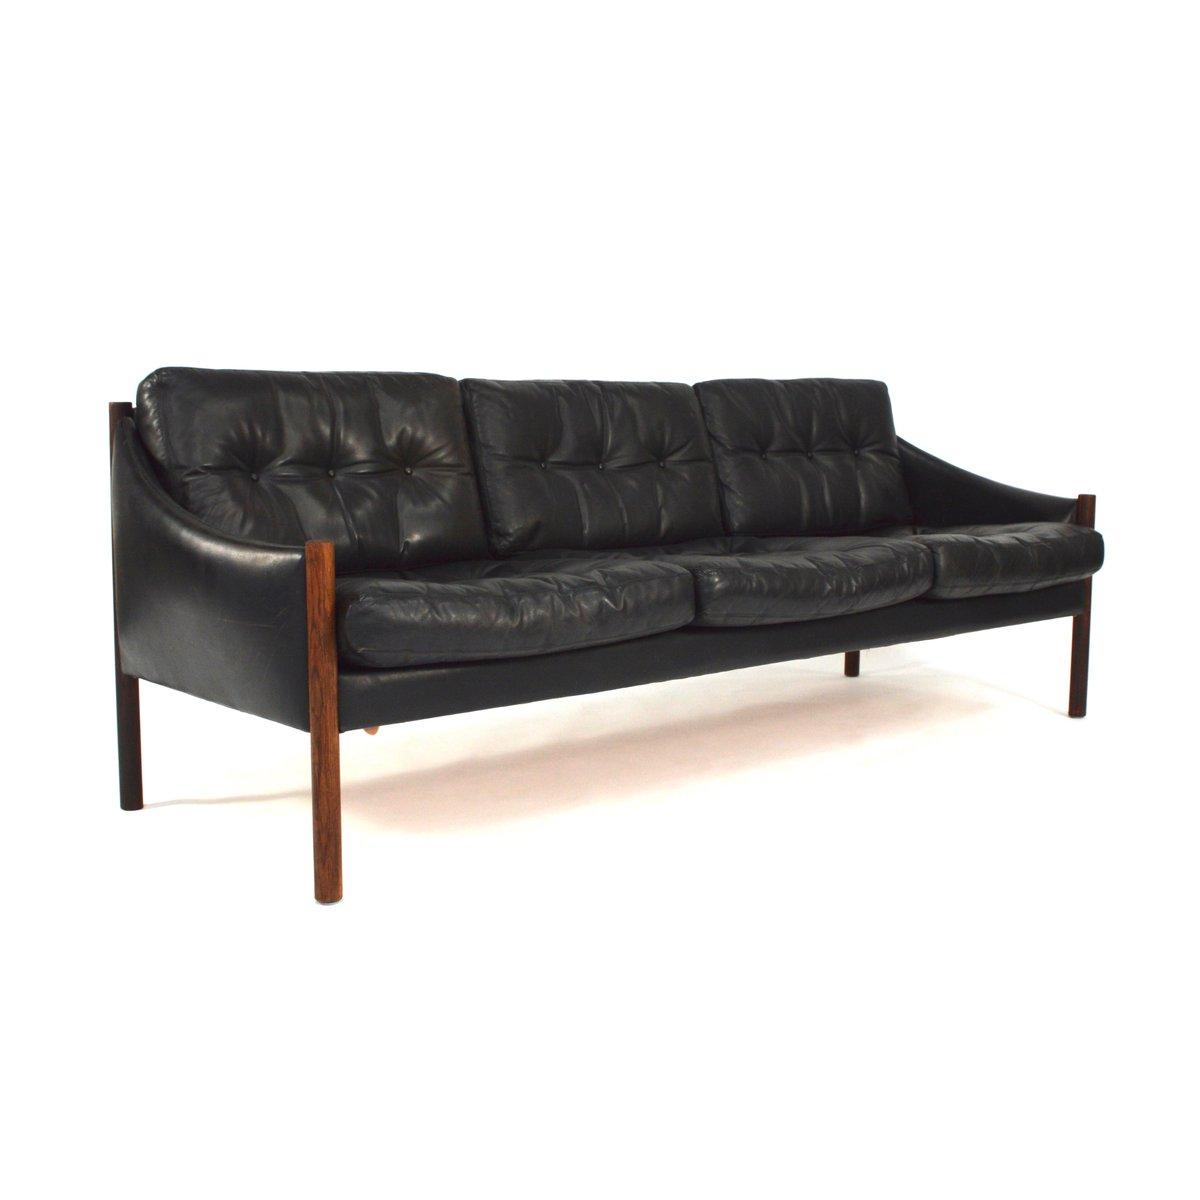 Mid Century Black Leather Sofa For Sale At Pamono